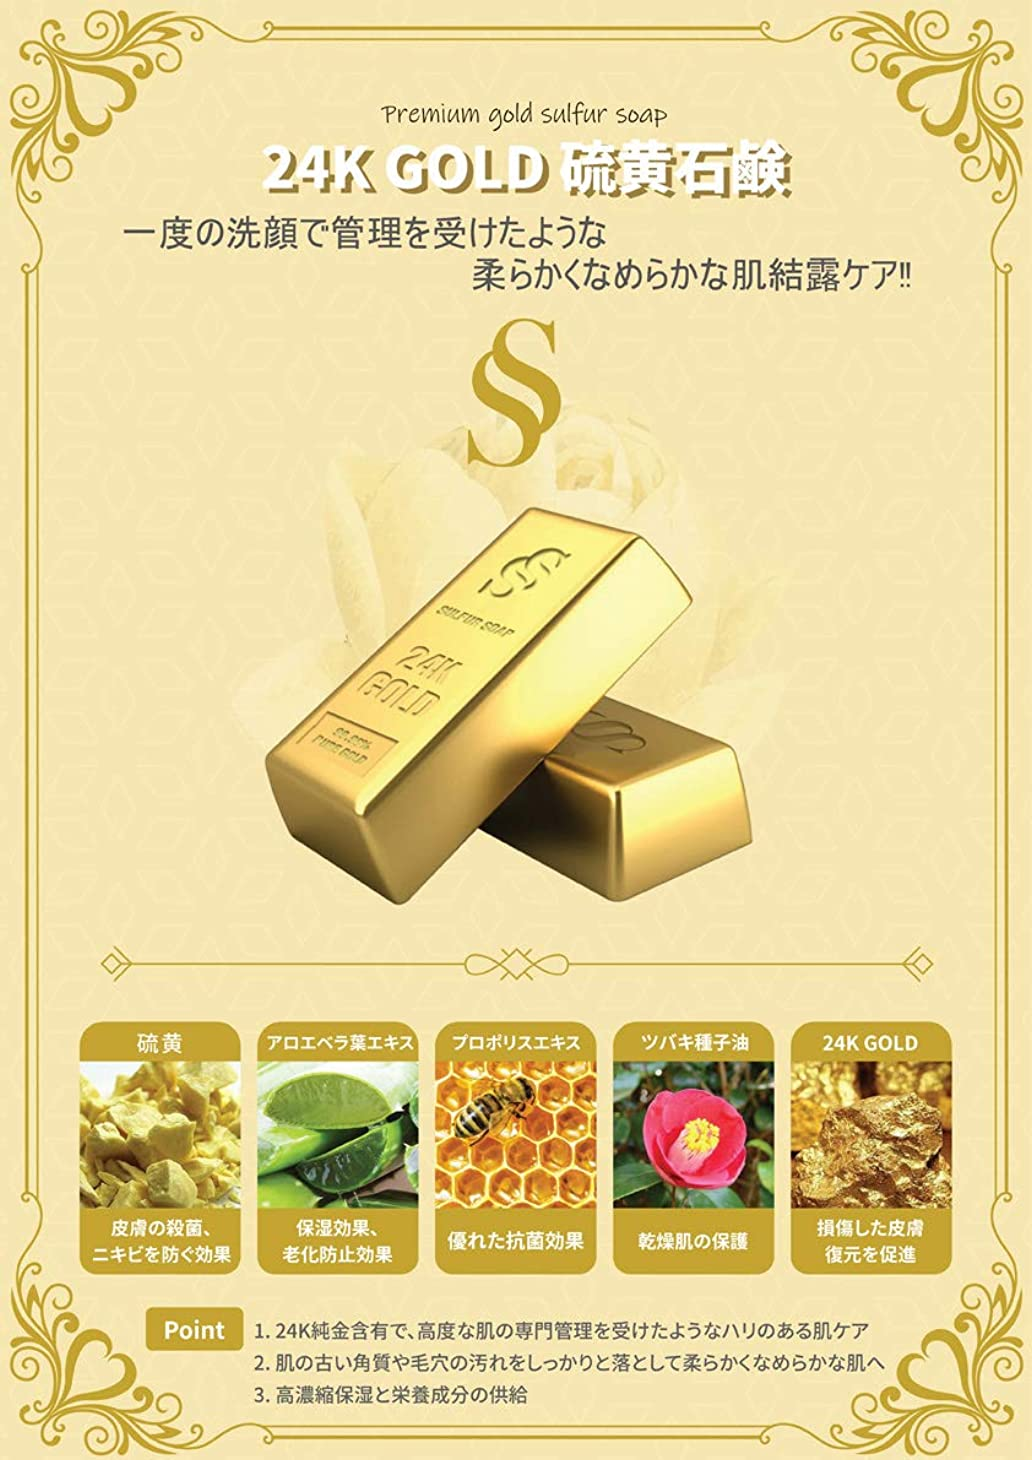 24Kゴールドバー 石鹸 植物性硫黄/24K SAKURA